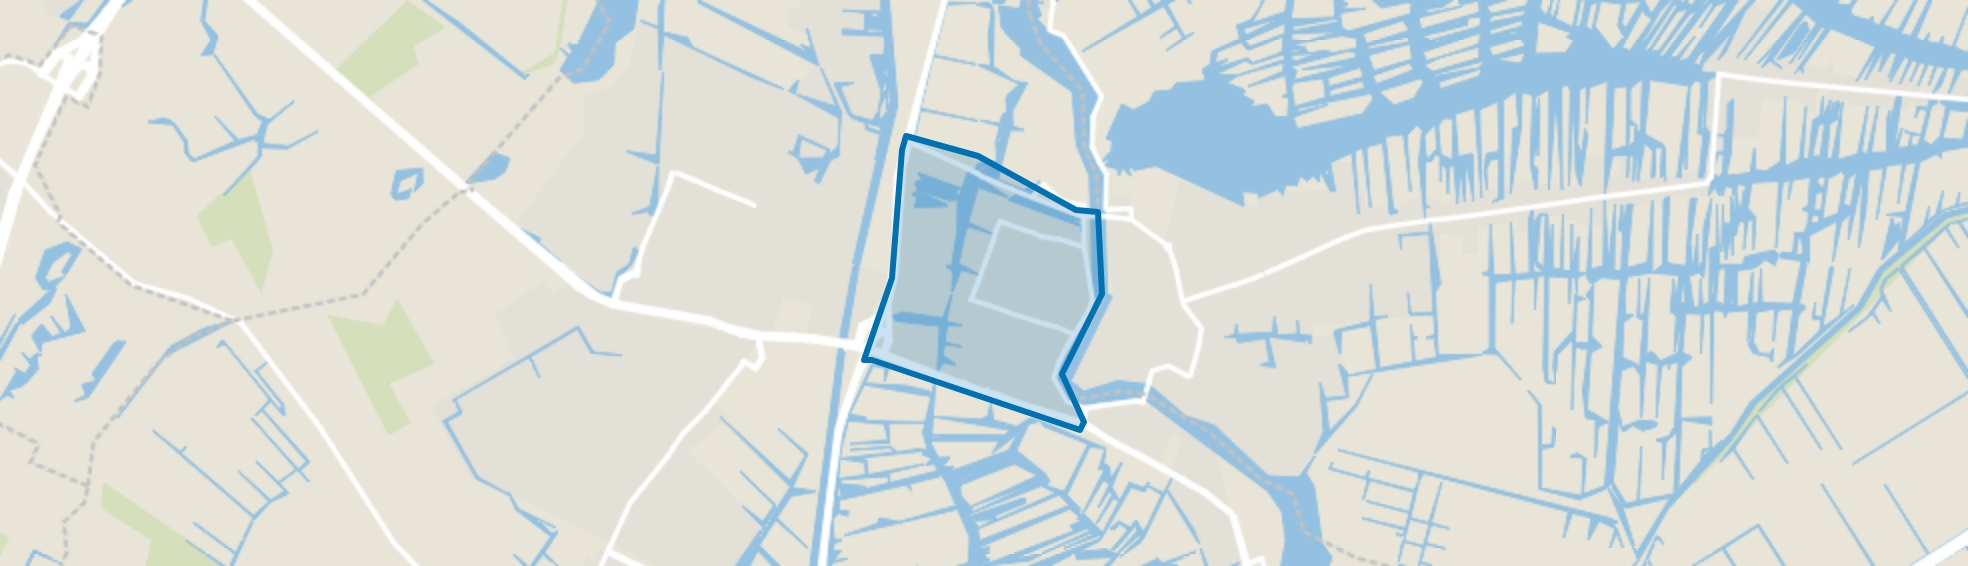 Wormerveer Noord, Wormerveer map